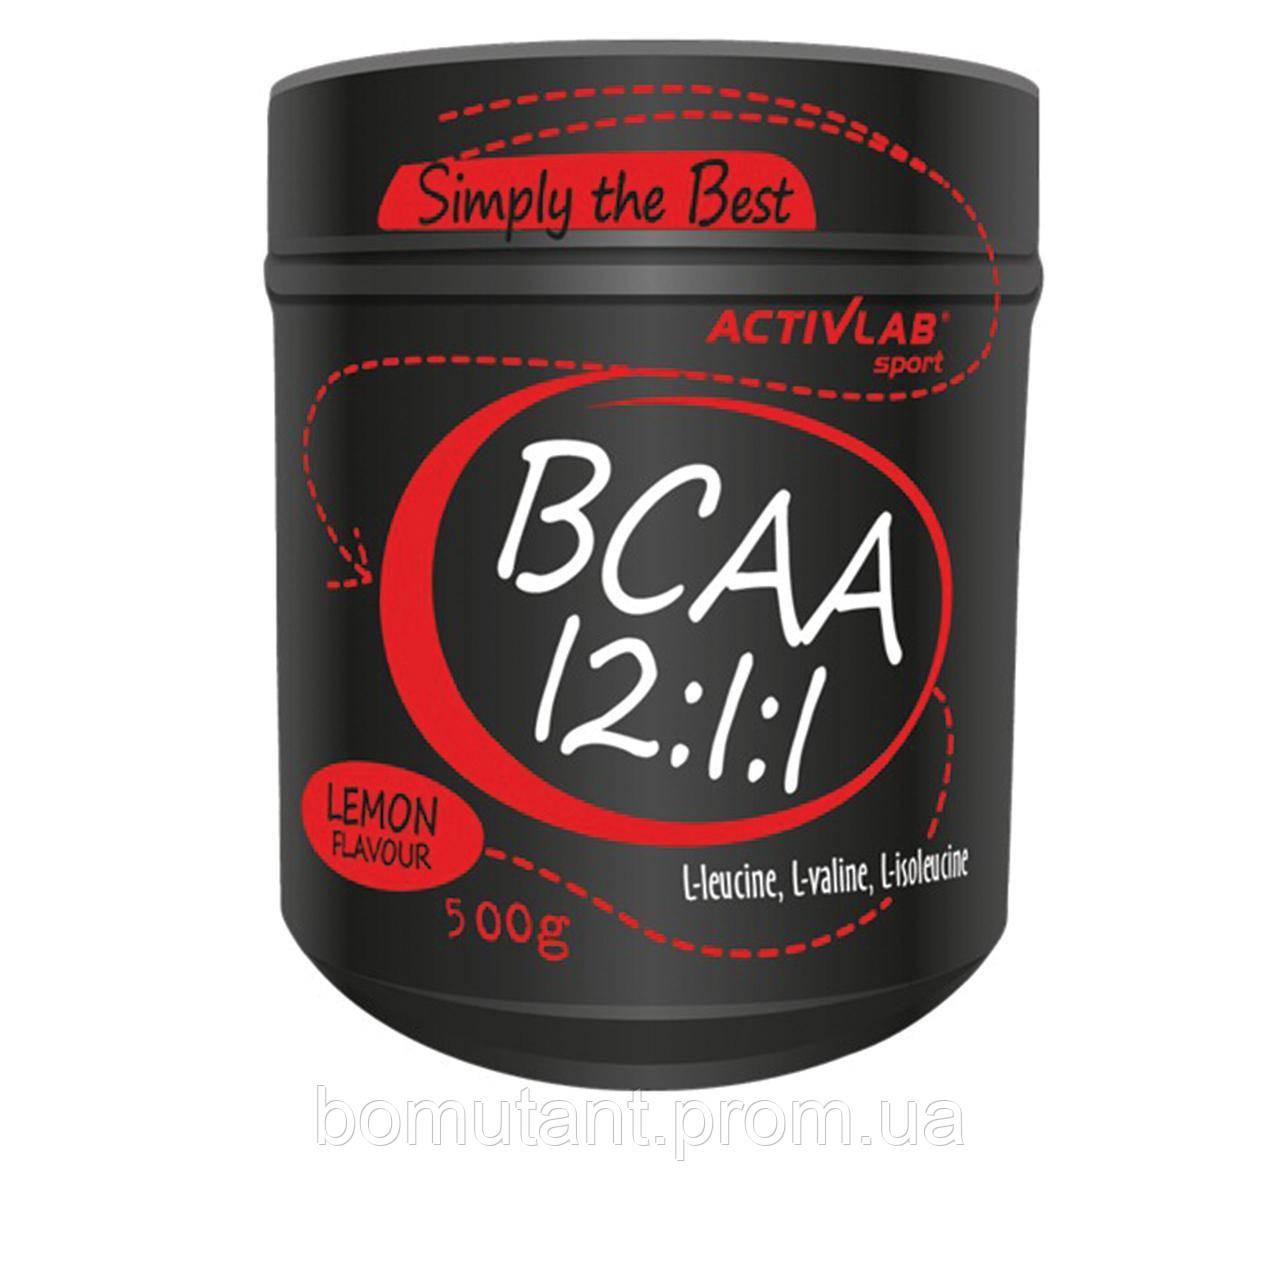 BCAA 12:1:1 500 гр grapefruit Activlab